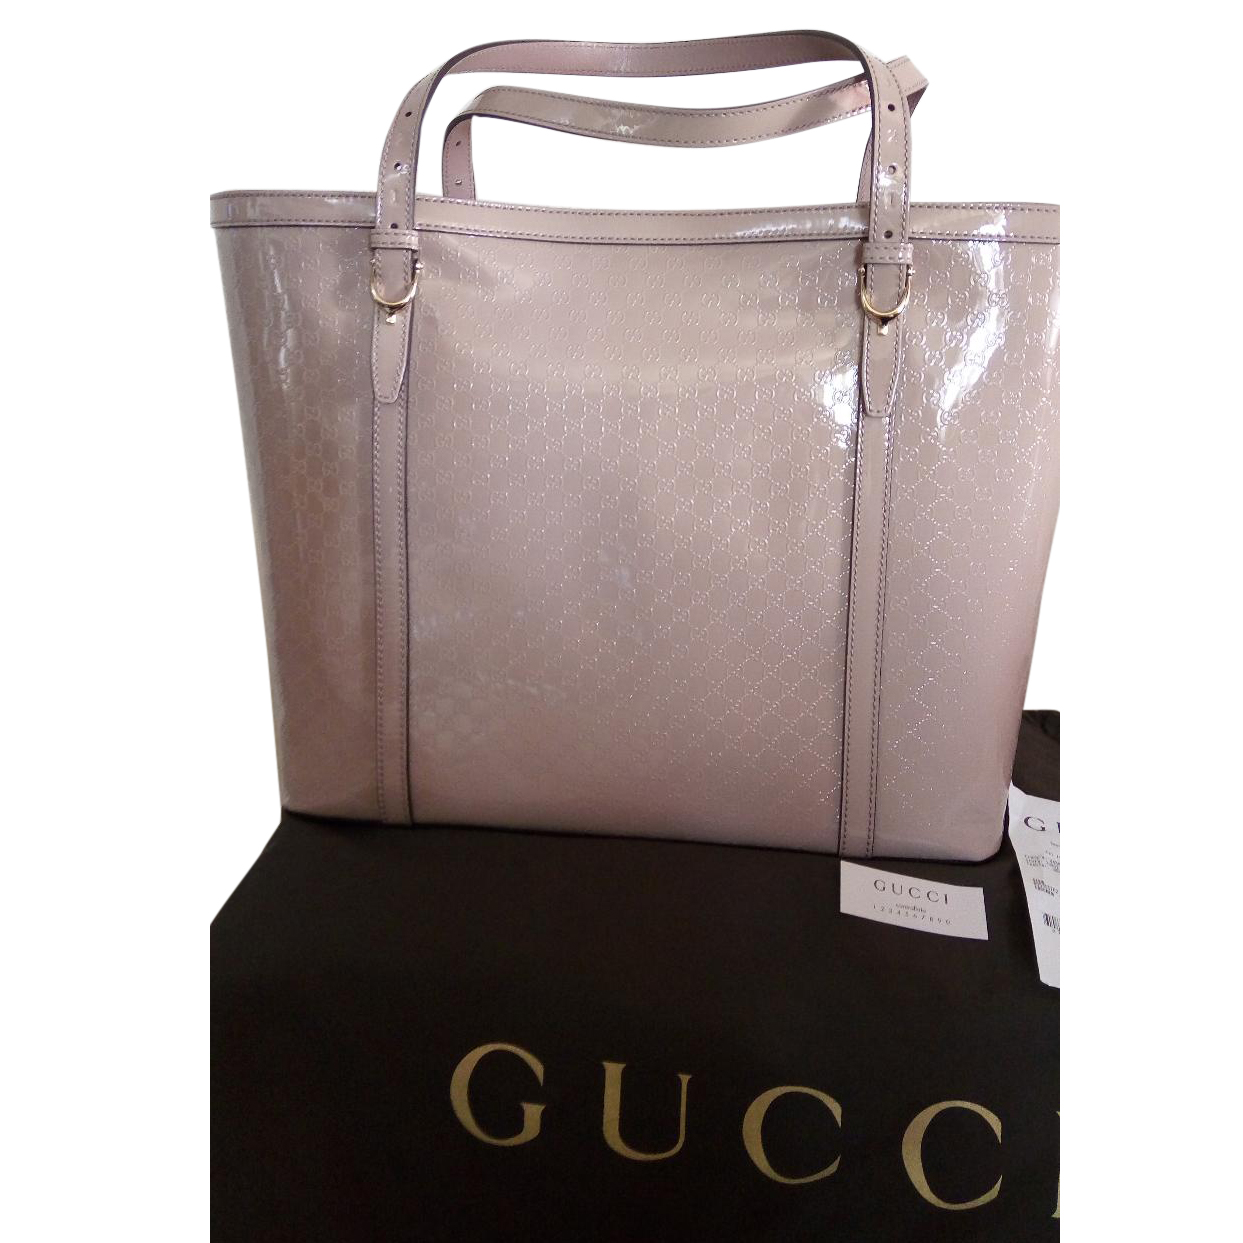 ffc50851c97c98 Gucci Borsa Nice Vernice Micro Guccissima Leather Bag | HEWI London